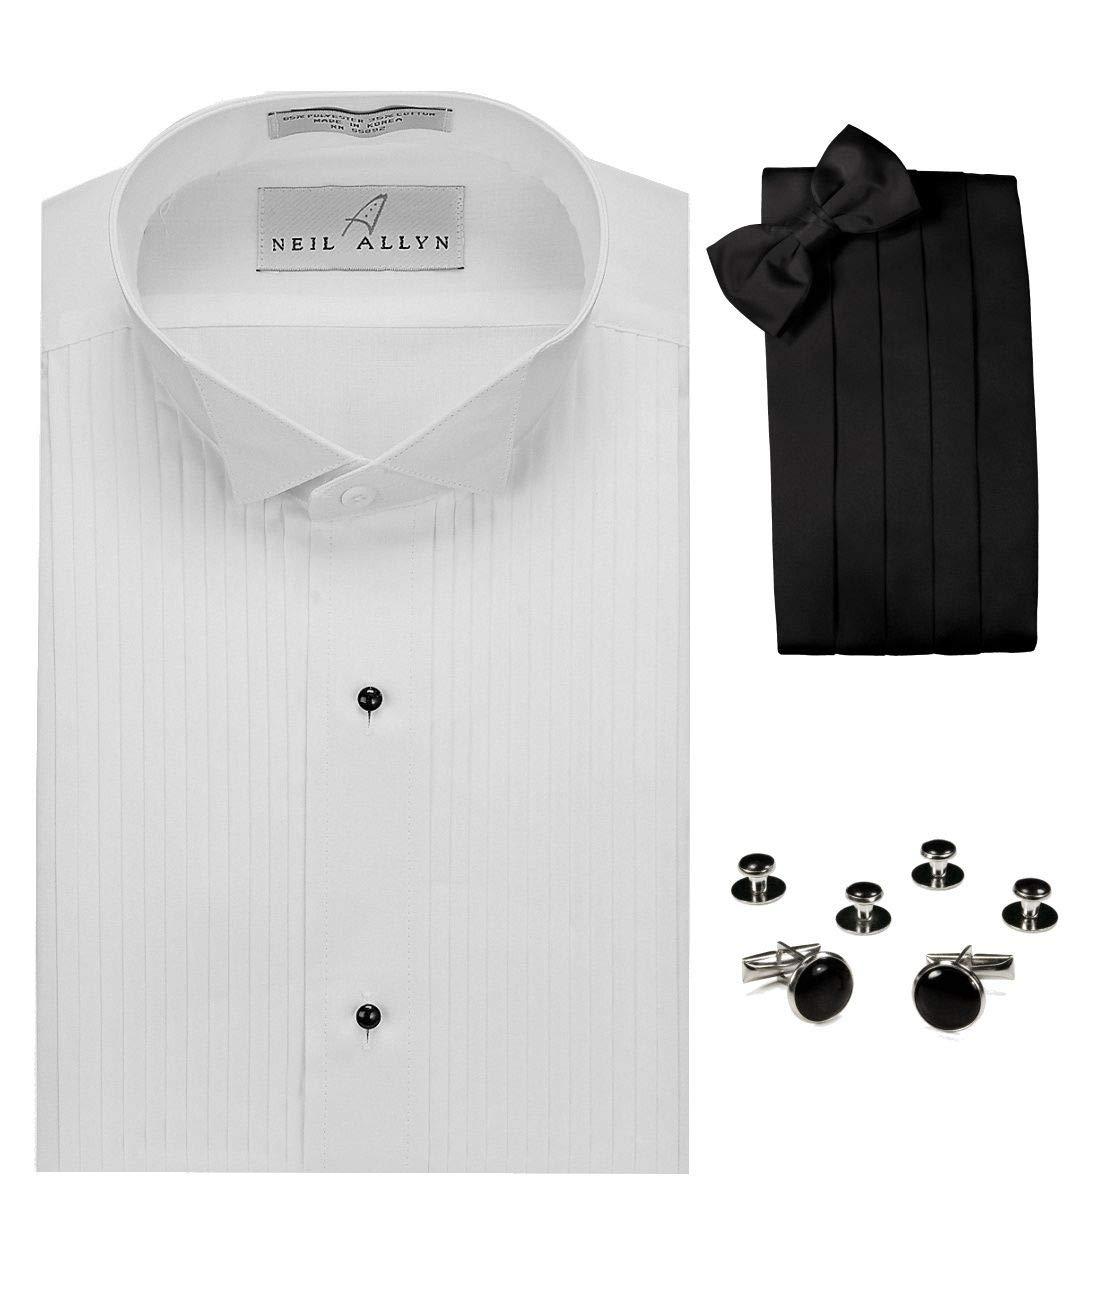 Wing Collar Tuxedo Shirt, Cummerbund, Bow-Tie, Cuff Links & Studs Set White by Neil Allyn